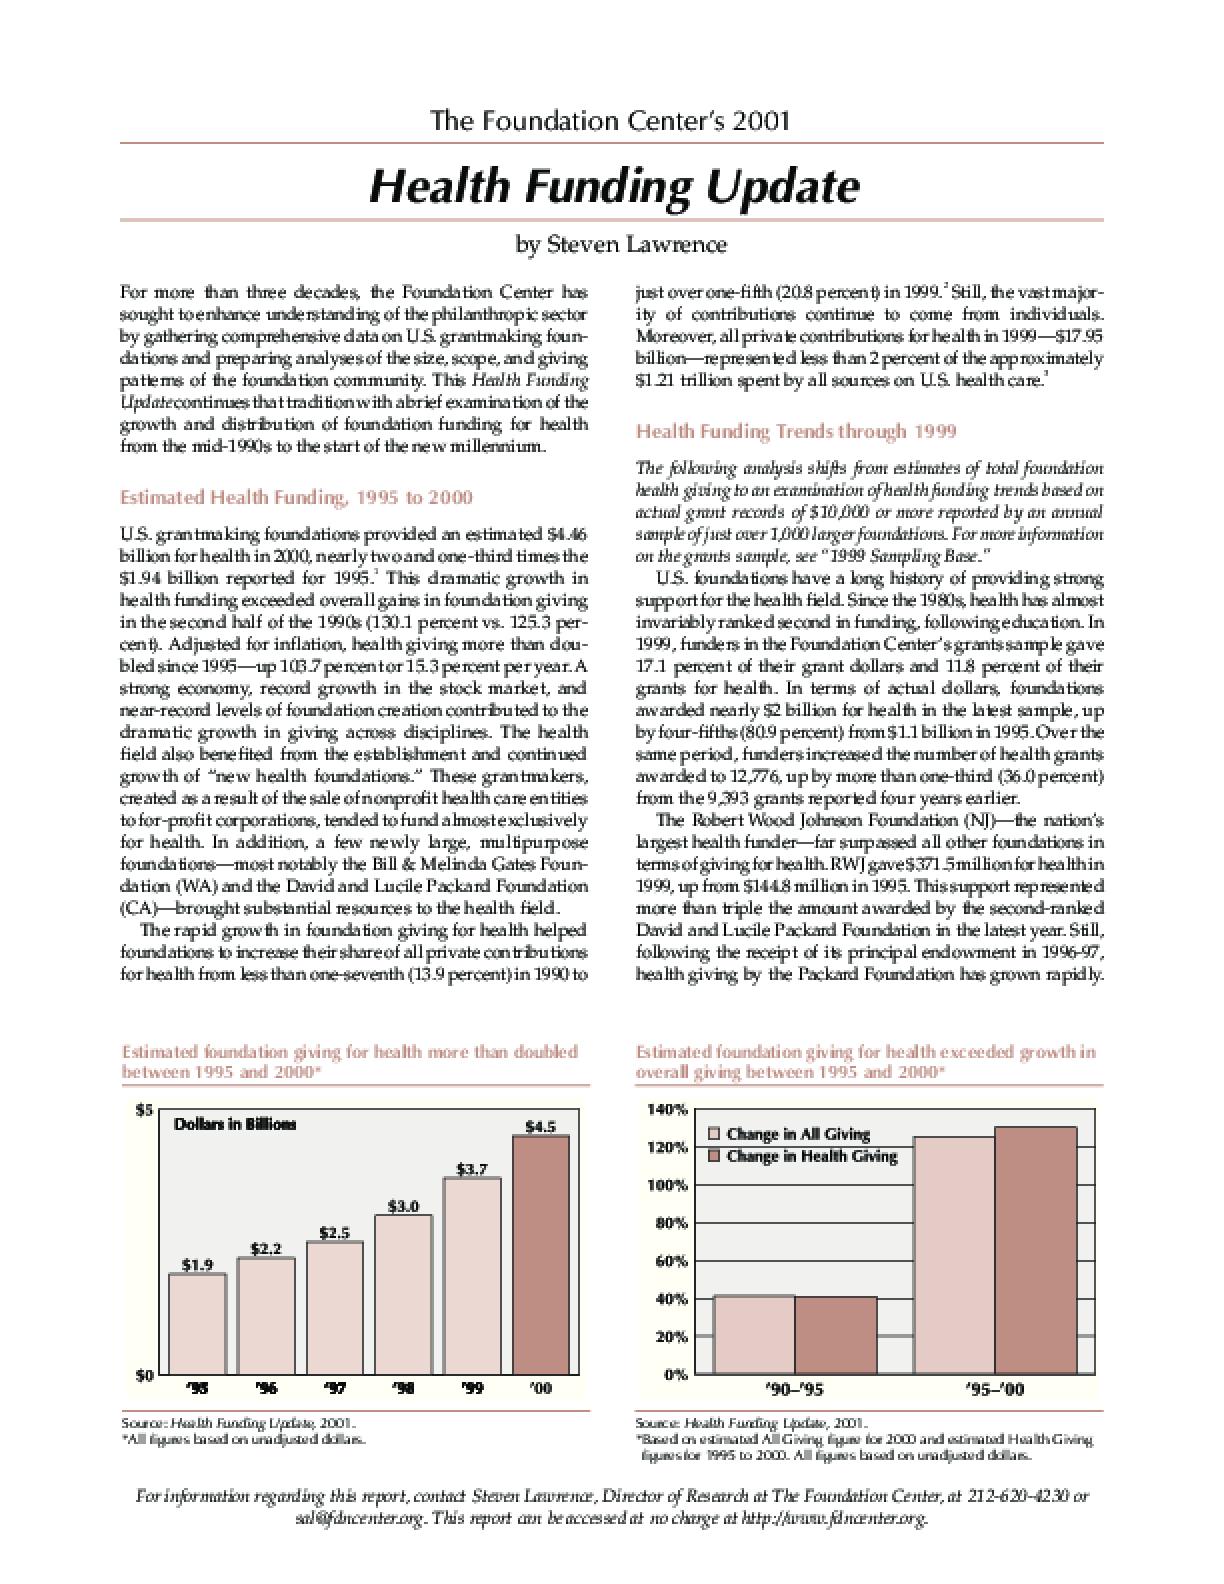 Health Funding Update, 2001